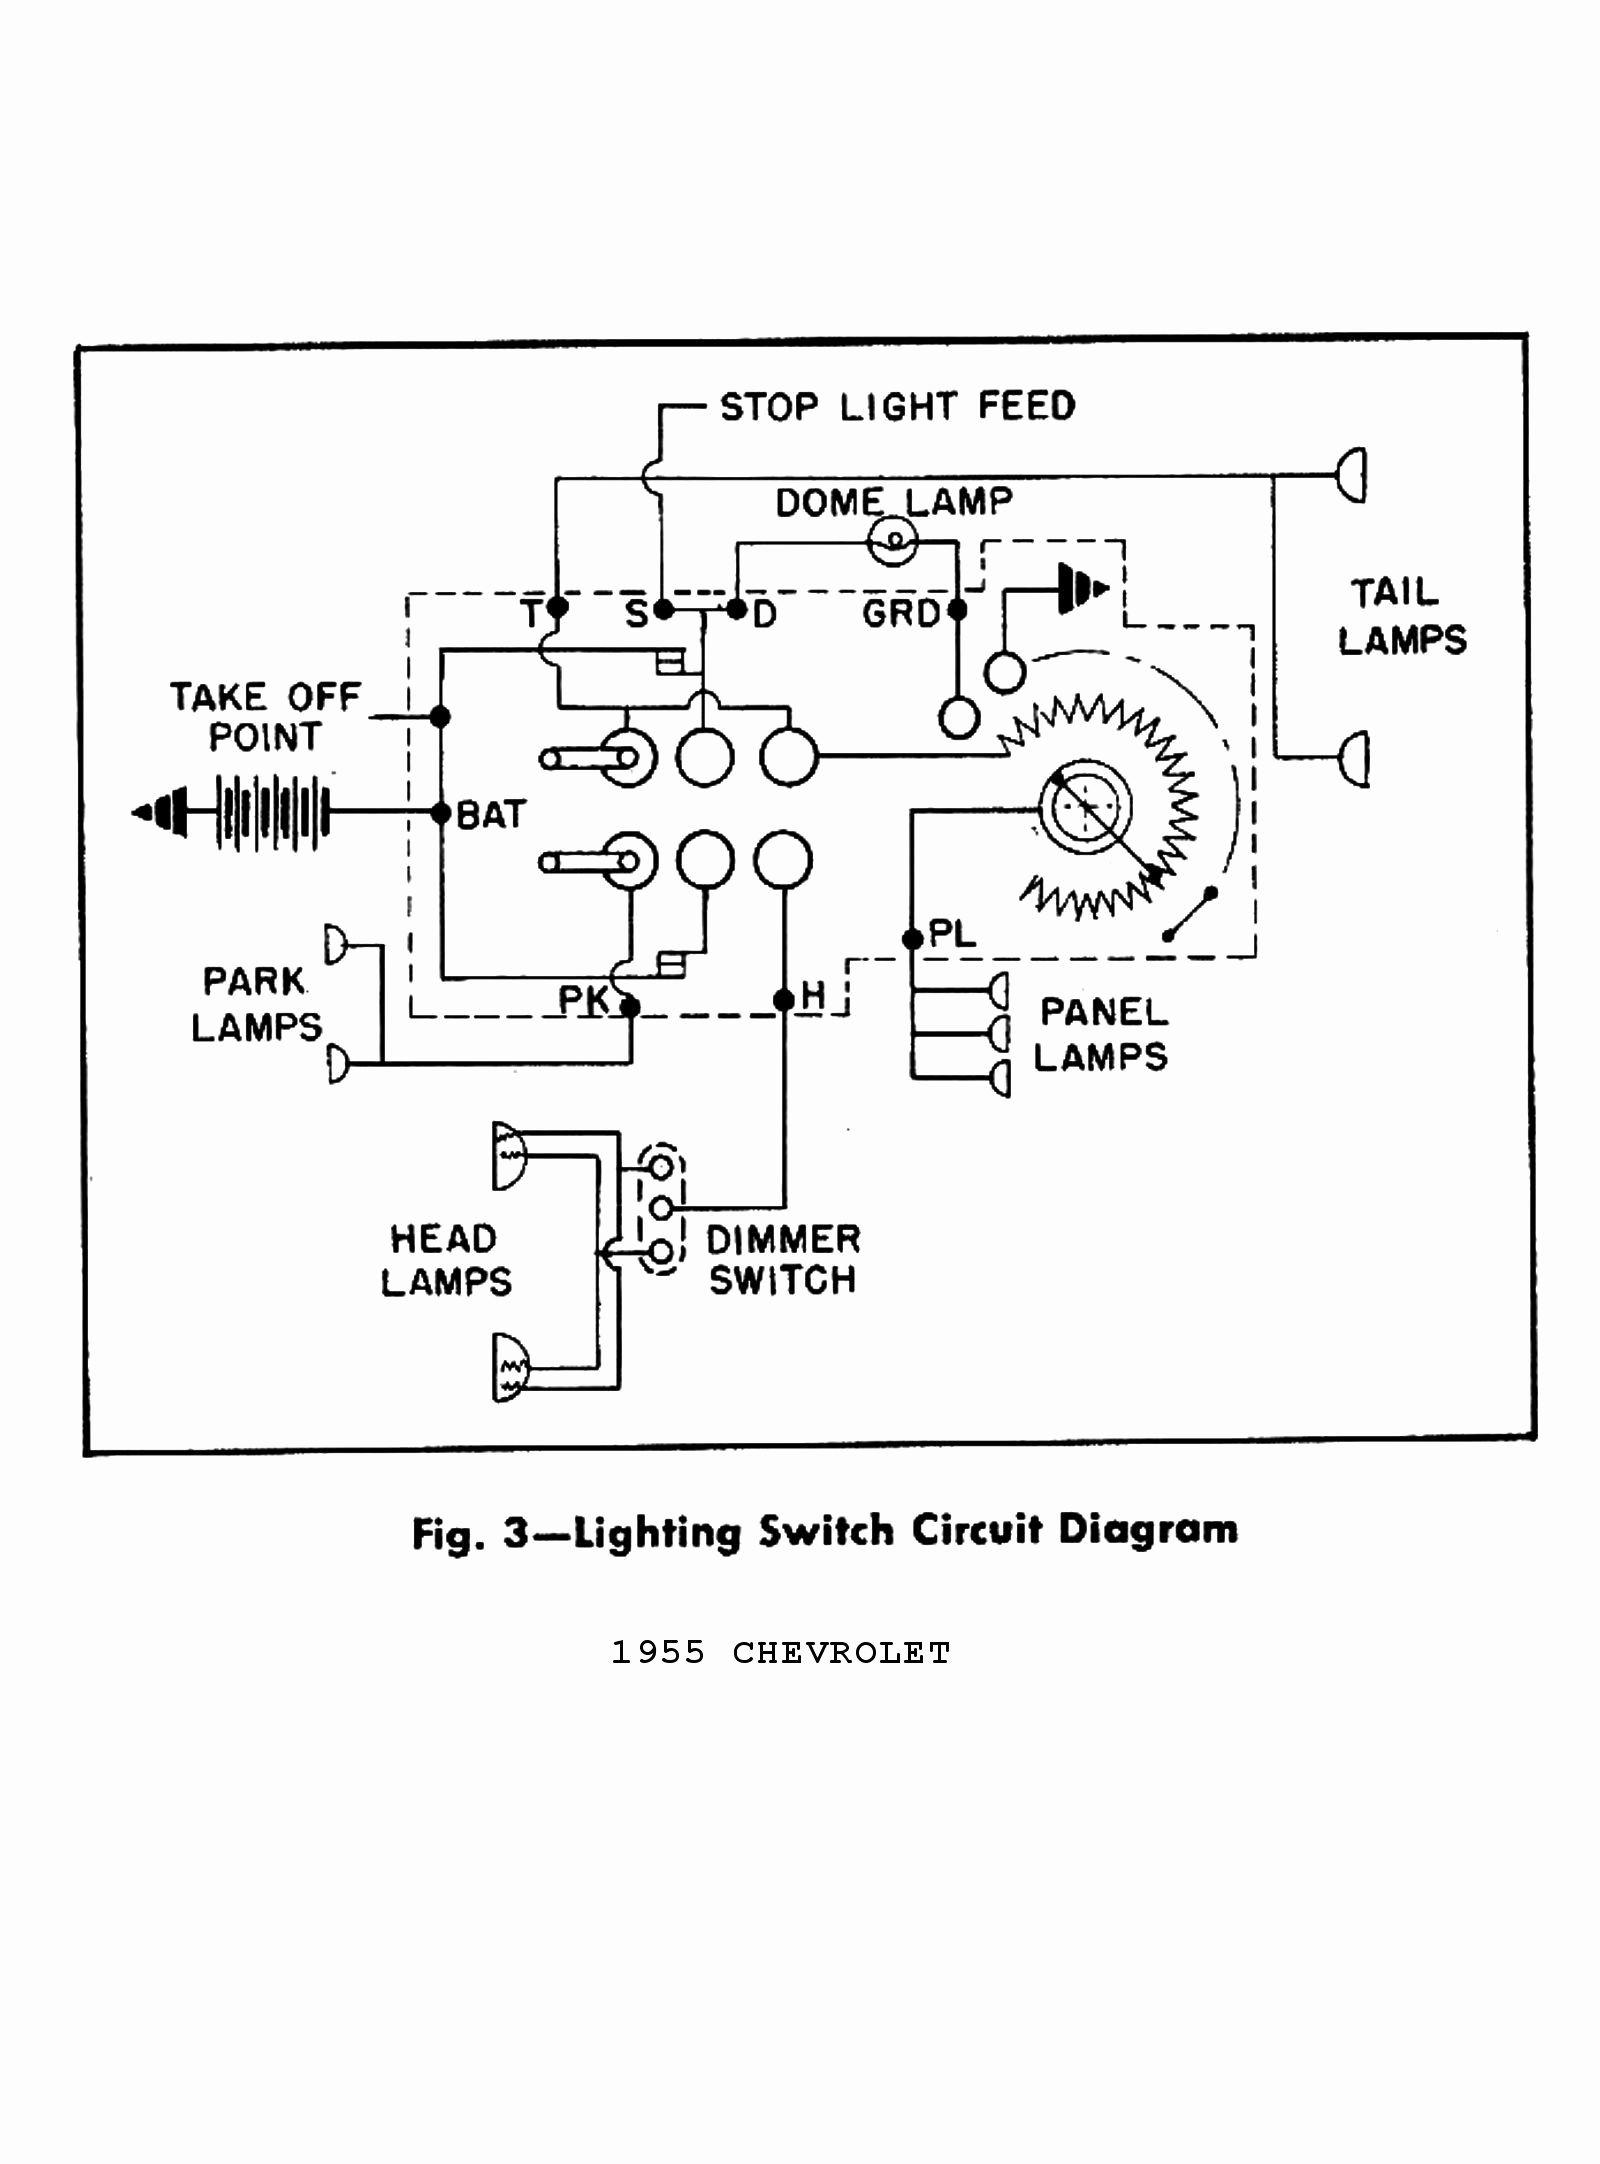 56 Chevy Wiring | Wiring Diagram - Sbc Starter Wiring Diagram